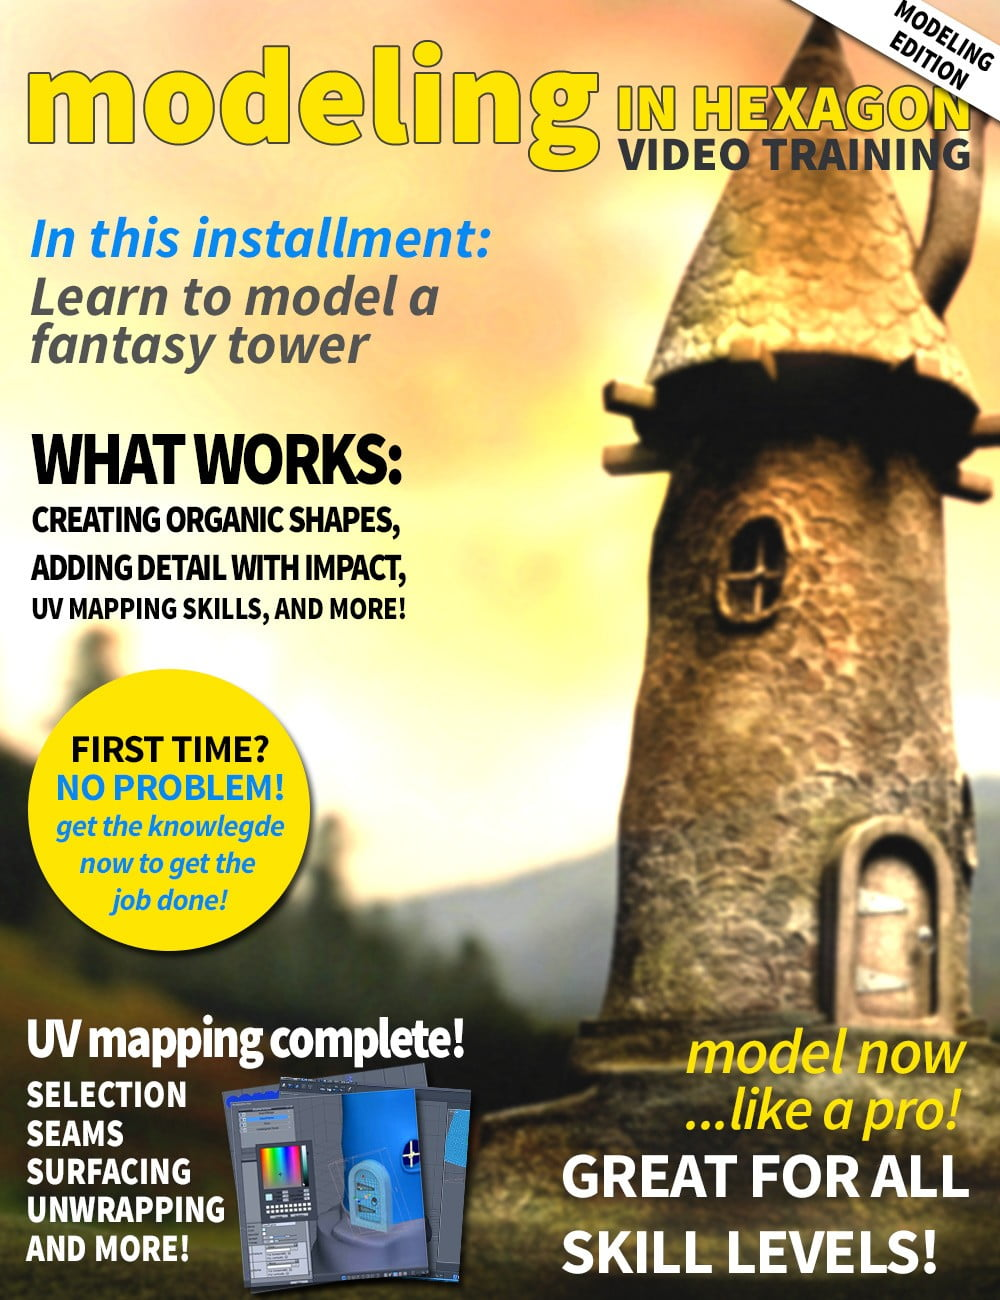 00-main-hexagon-modeling-fantasy-tower-daz3d